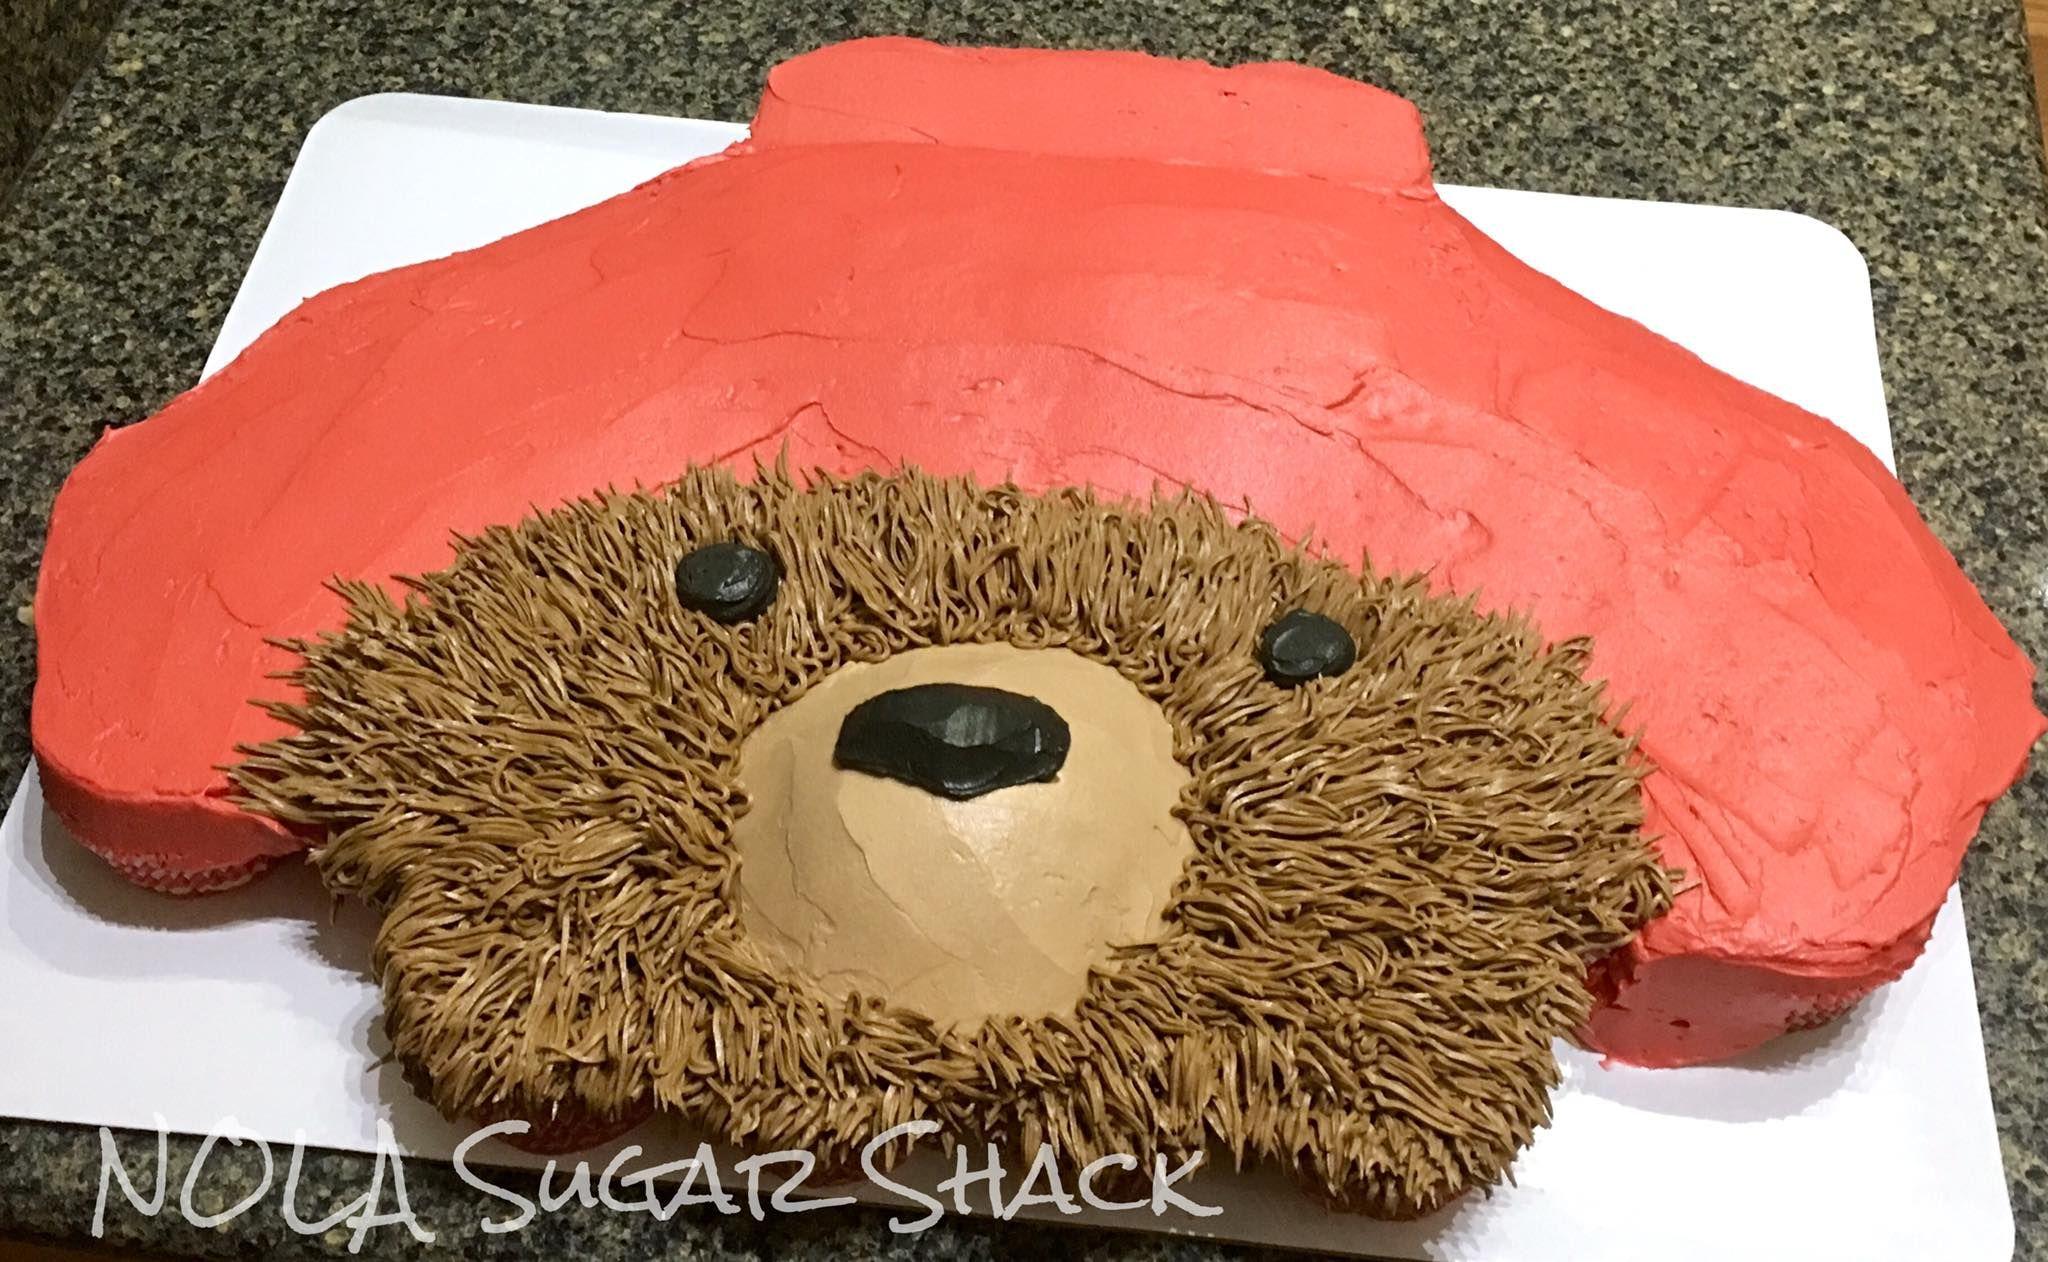 Paddington inspired pull-apart cupcake cake by NOLA Sugar Shack